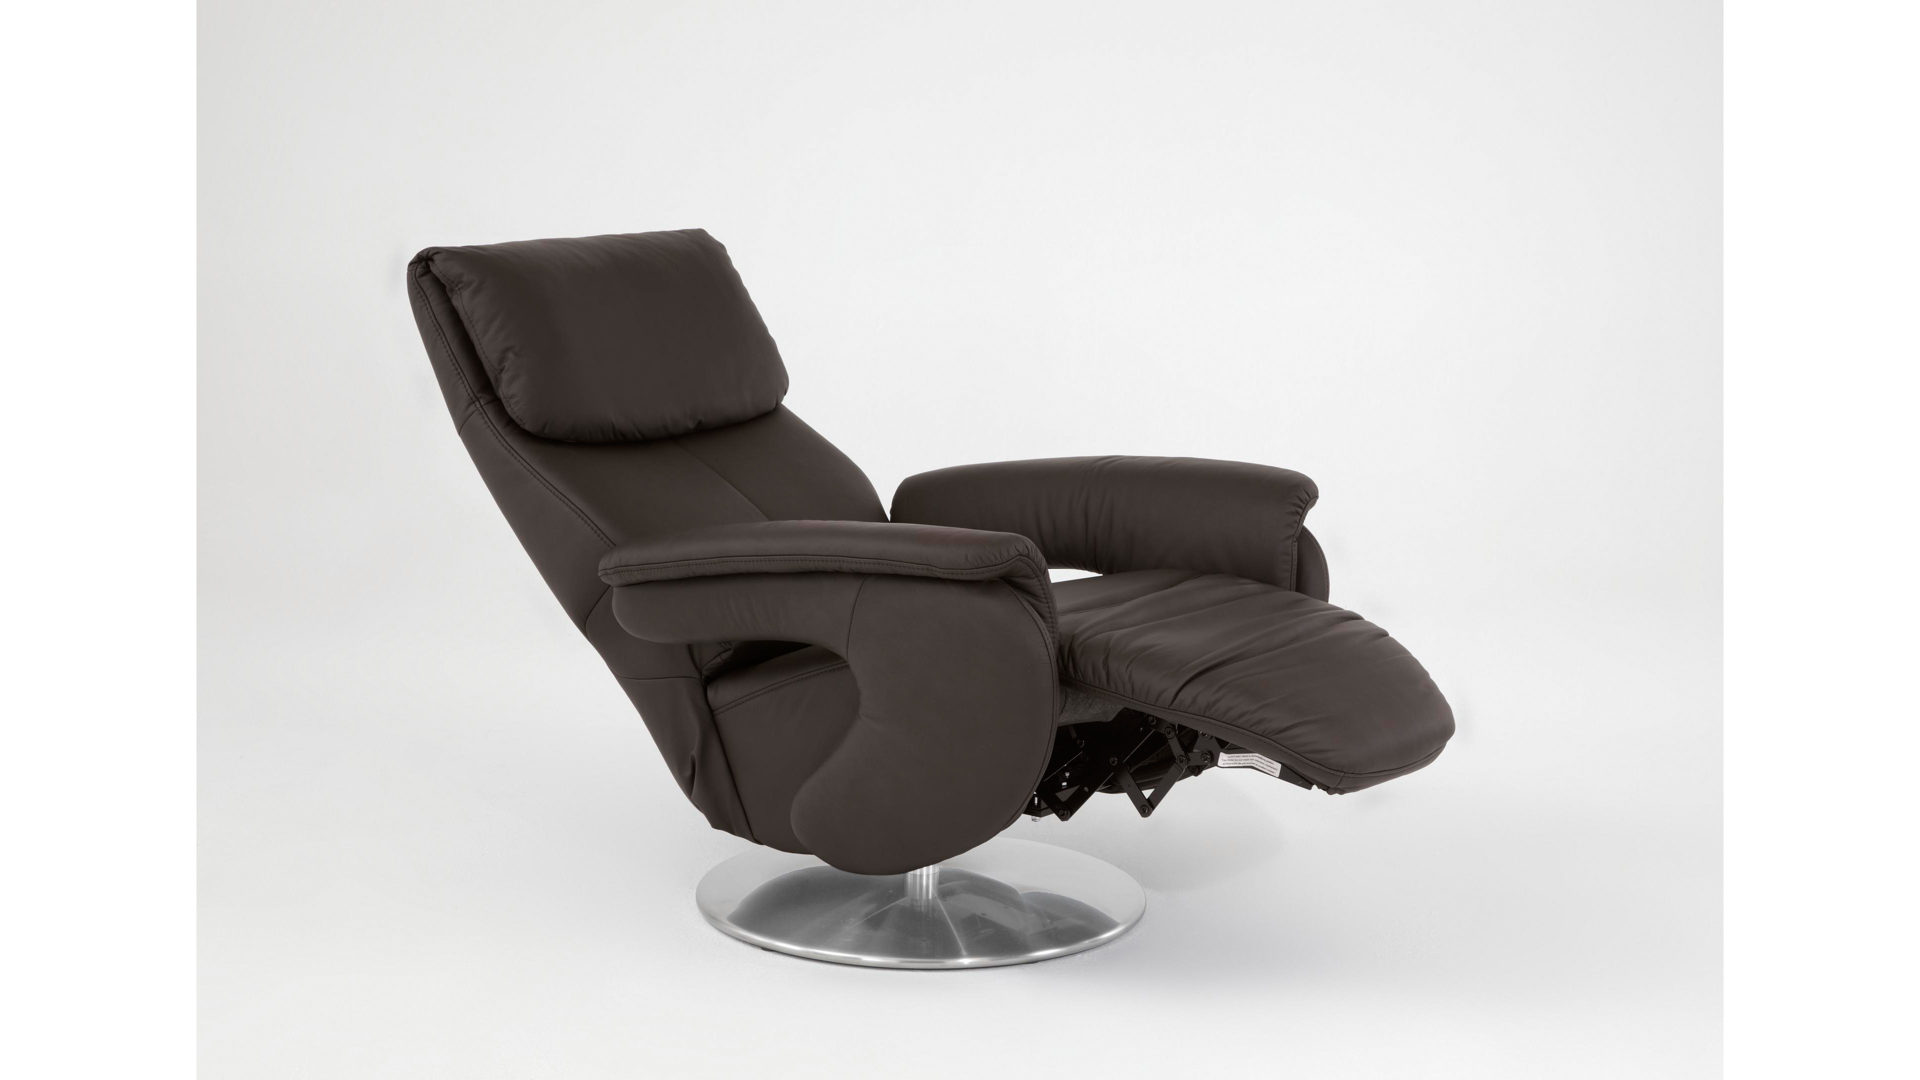 Comfortmaster Easy Swing Sessel 7344 Schokofarbenes Longlife Leder